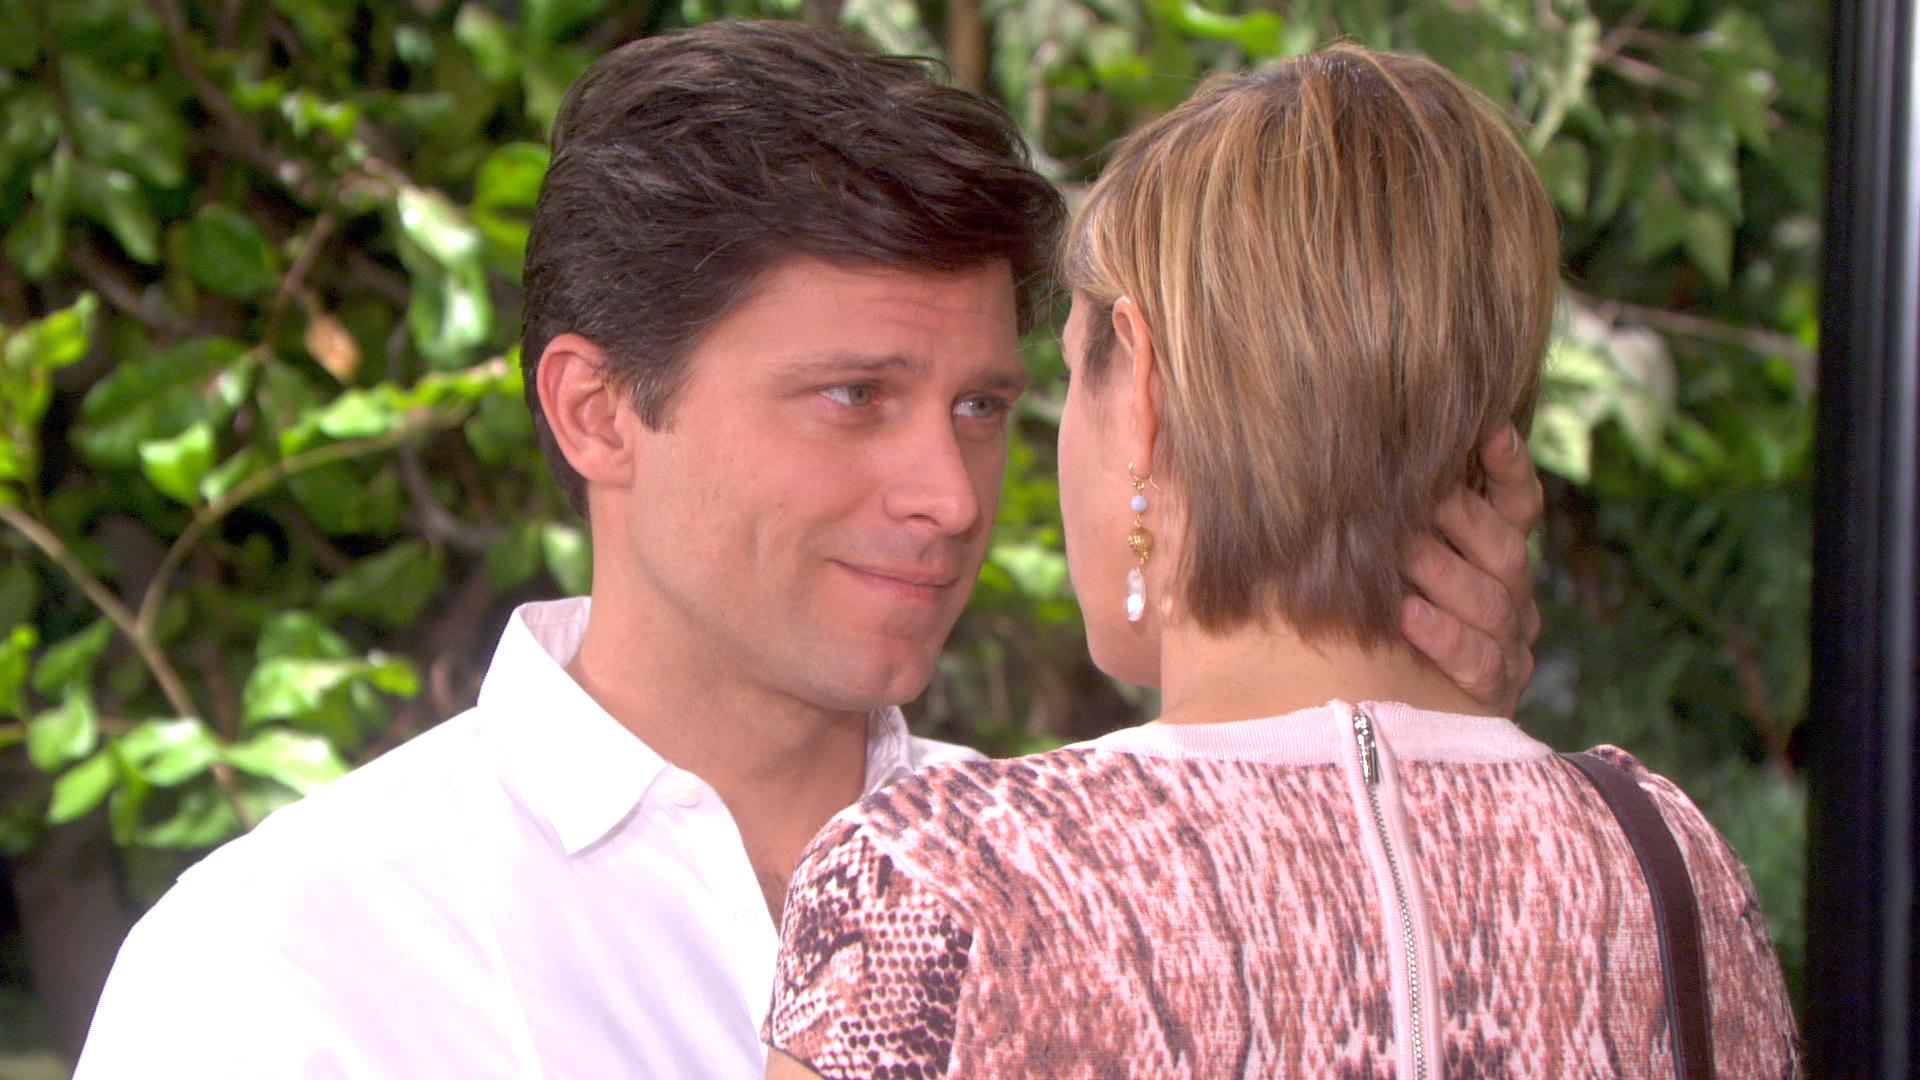 Eric has a romantic surprise for Nicole.